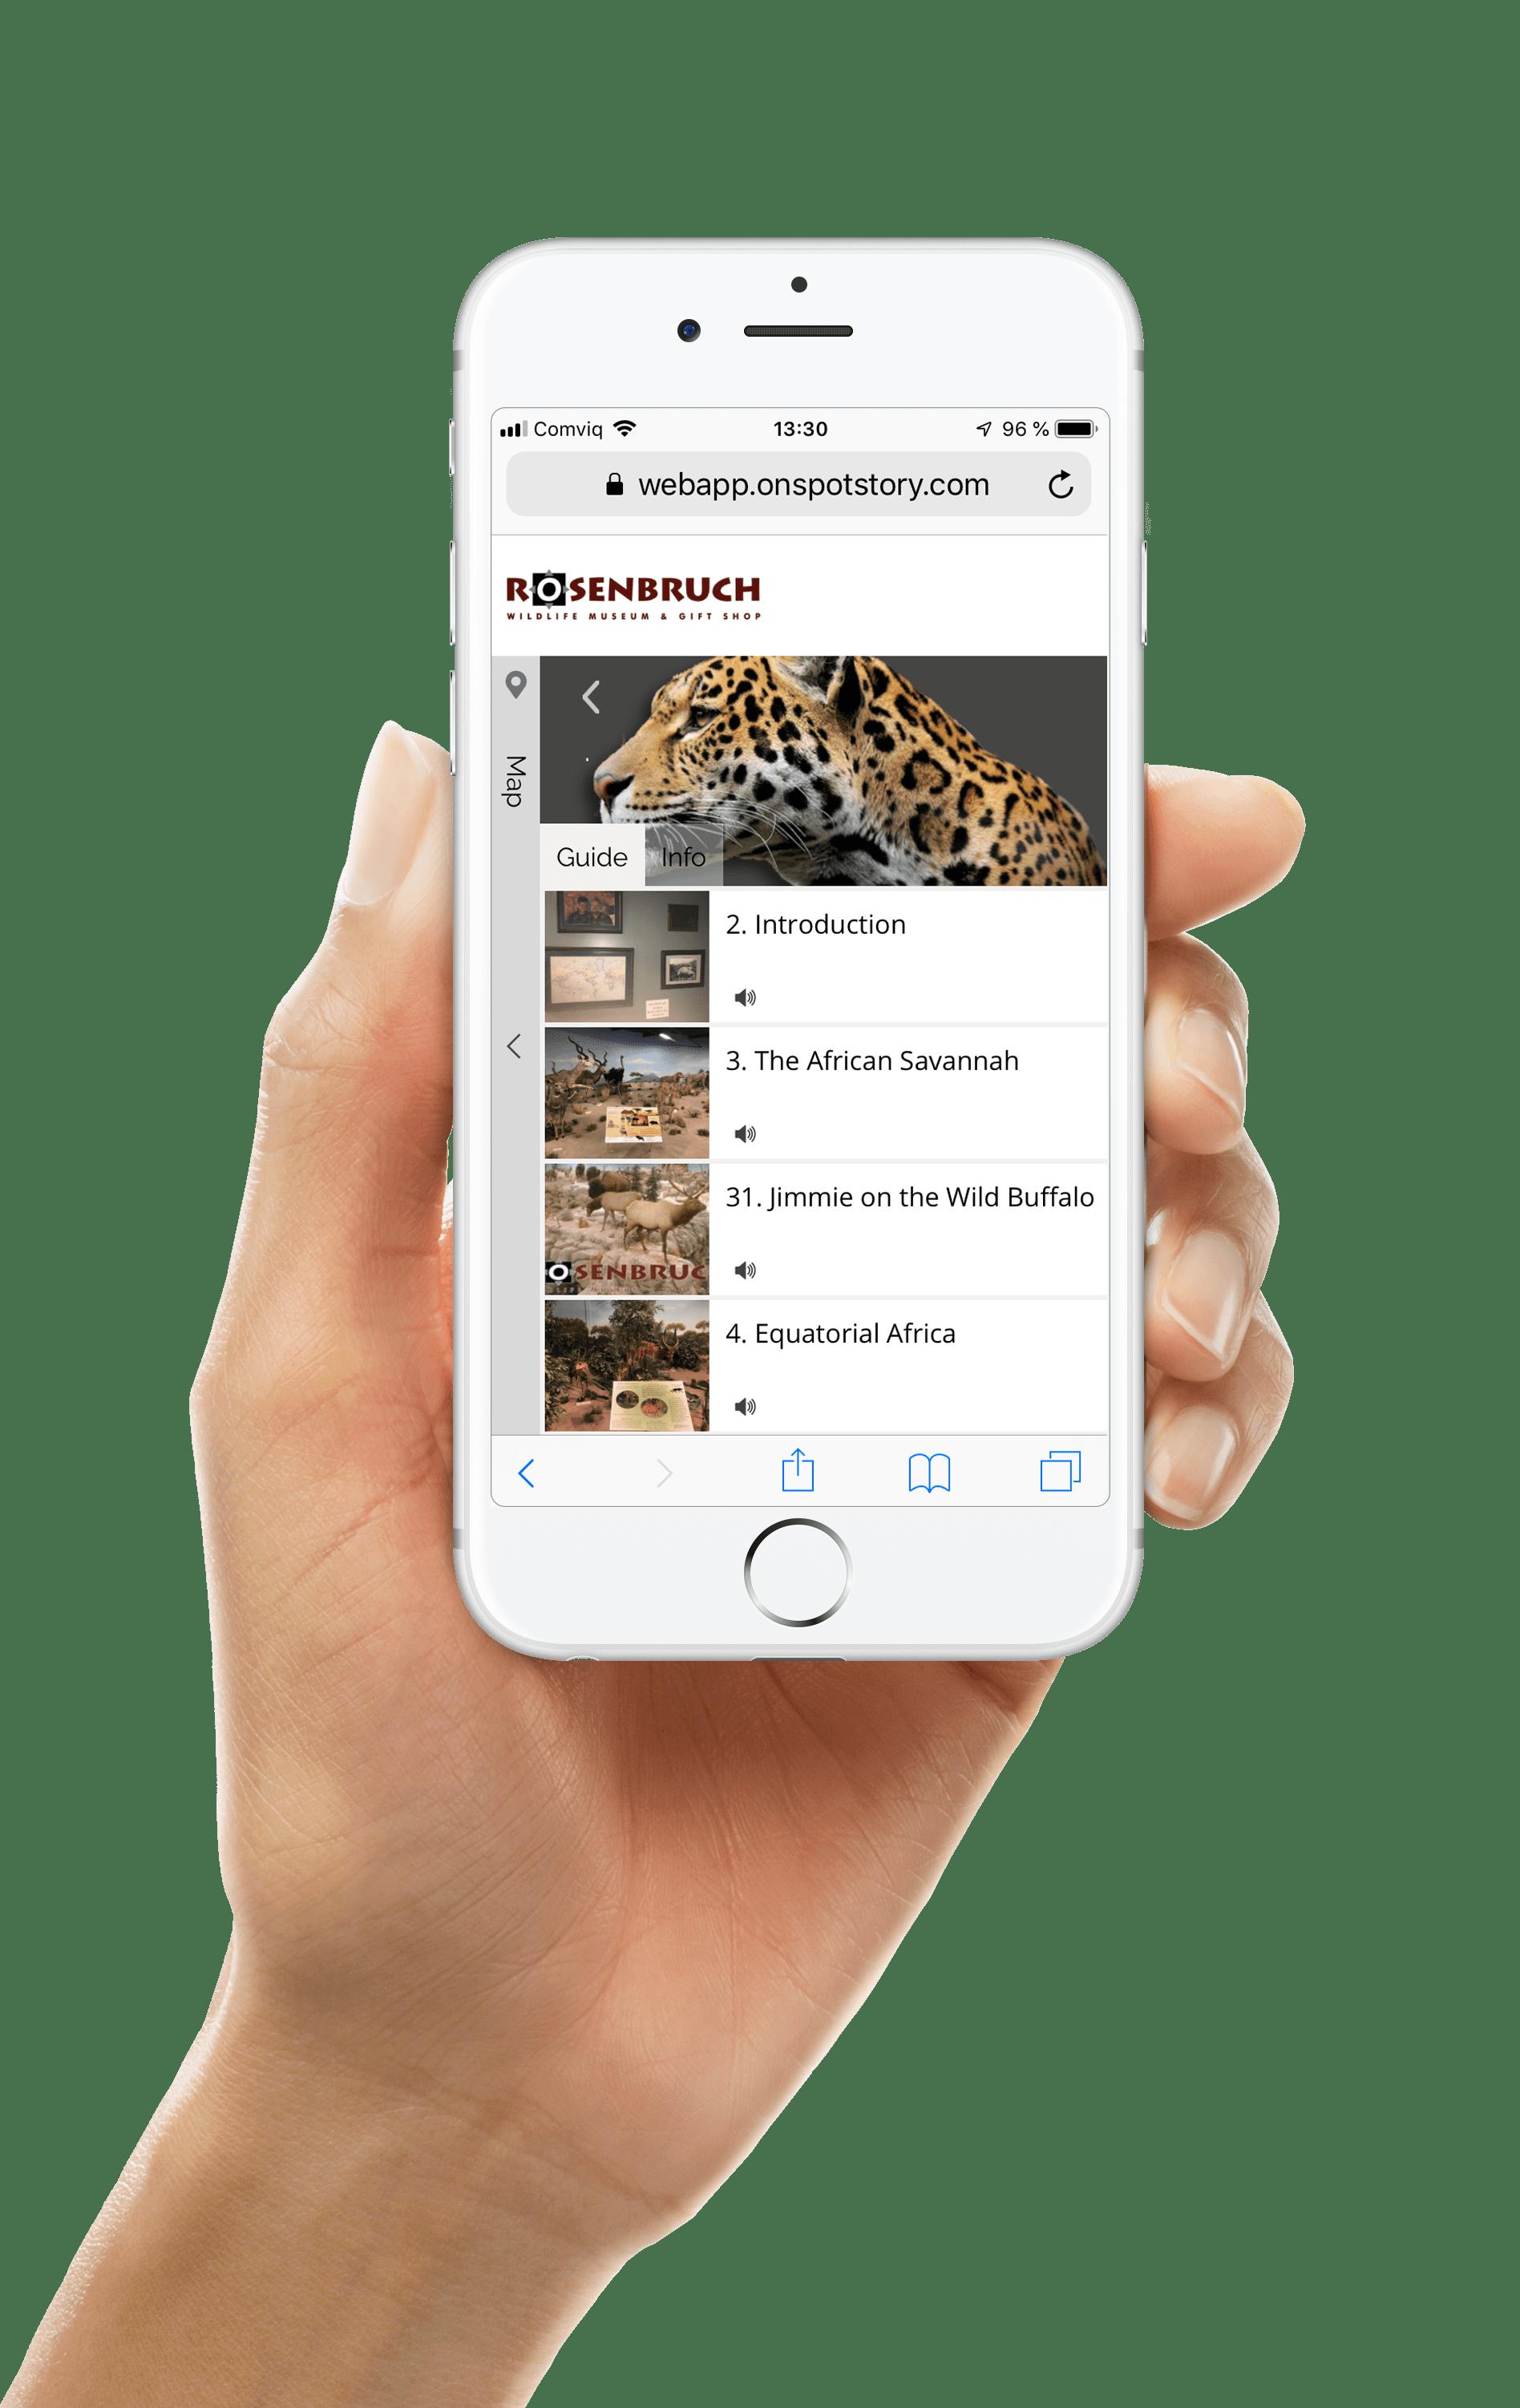 rosenbruch wildlife museum web app